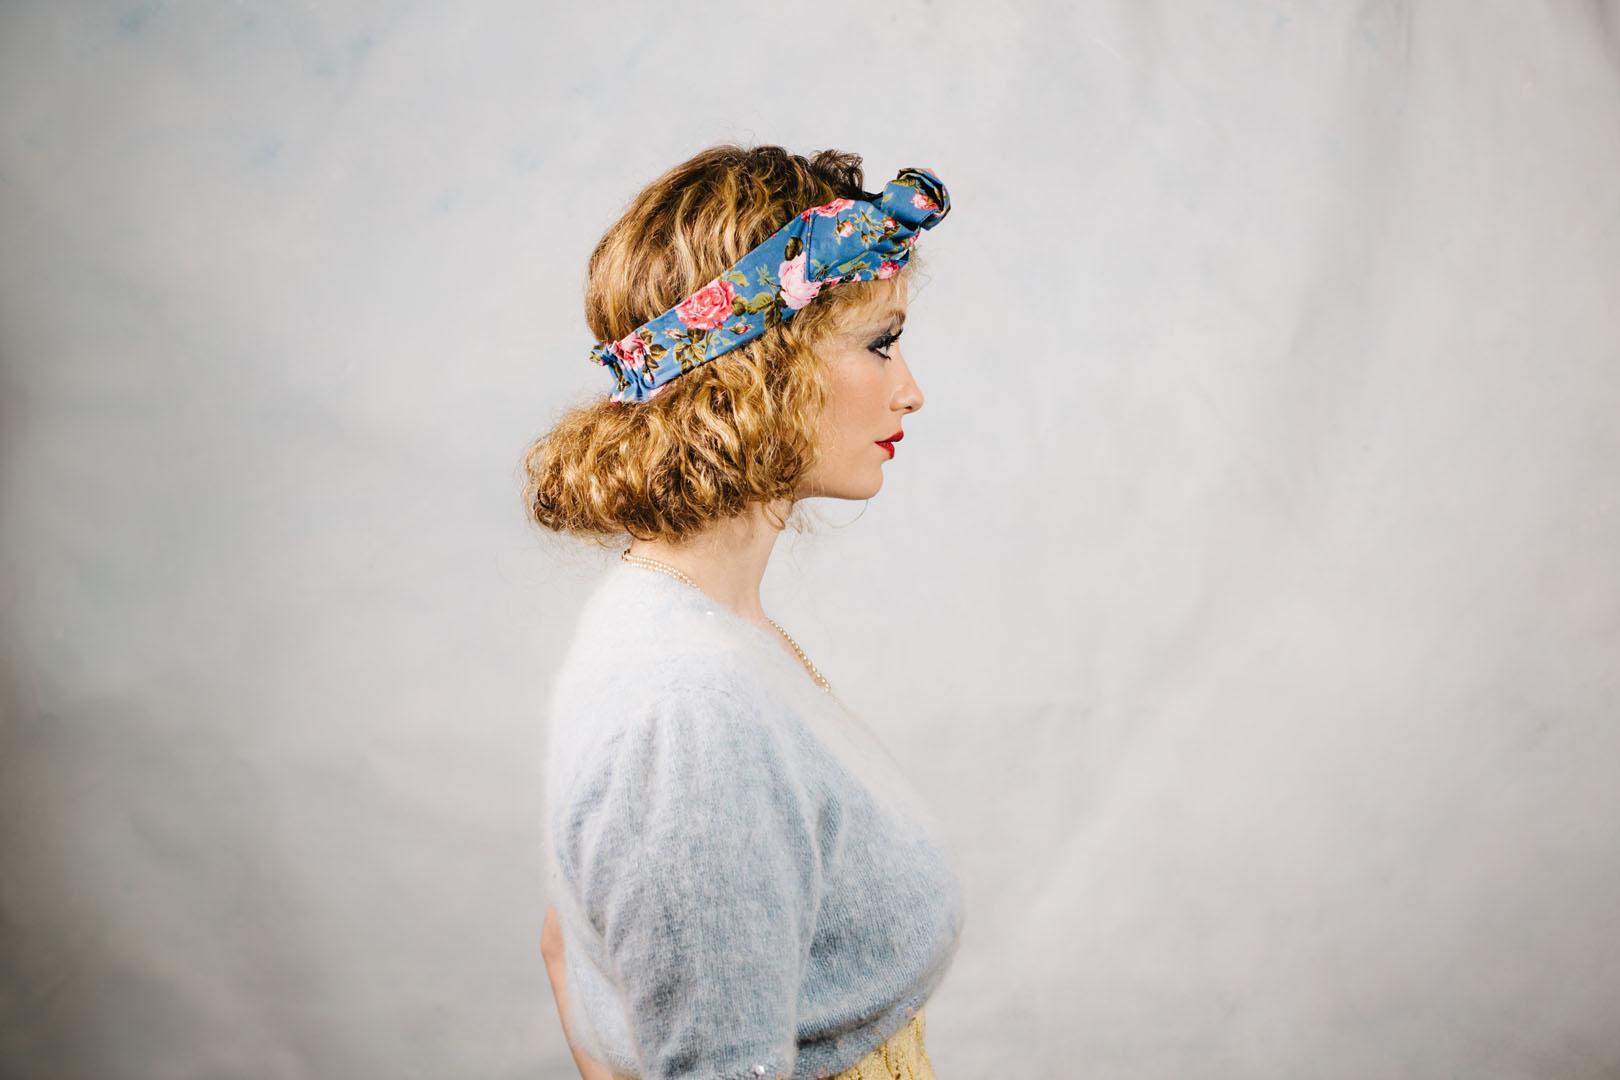 periwinkle blue cath kidston headband   cath kidston floral headband periwinkle blue   floral cath kidston headband periwinkle blue ... 7b79c486bd5